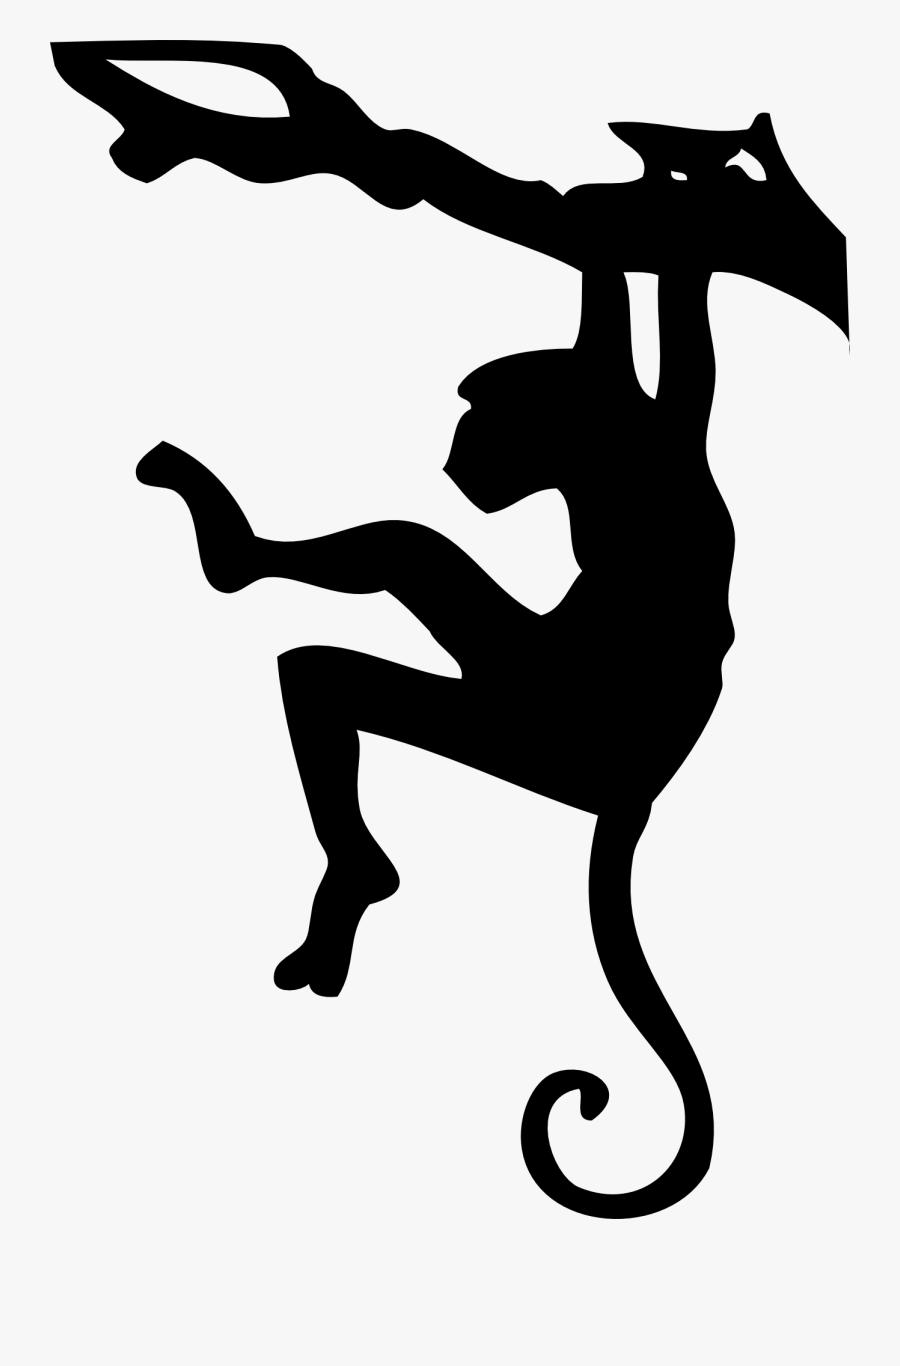 Hanging Monkey Clipart Black - Monkey Silhouette, Transparent Clipart